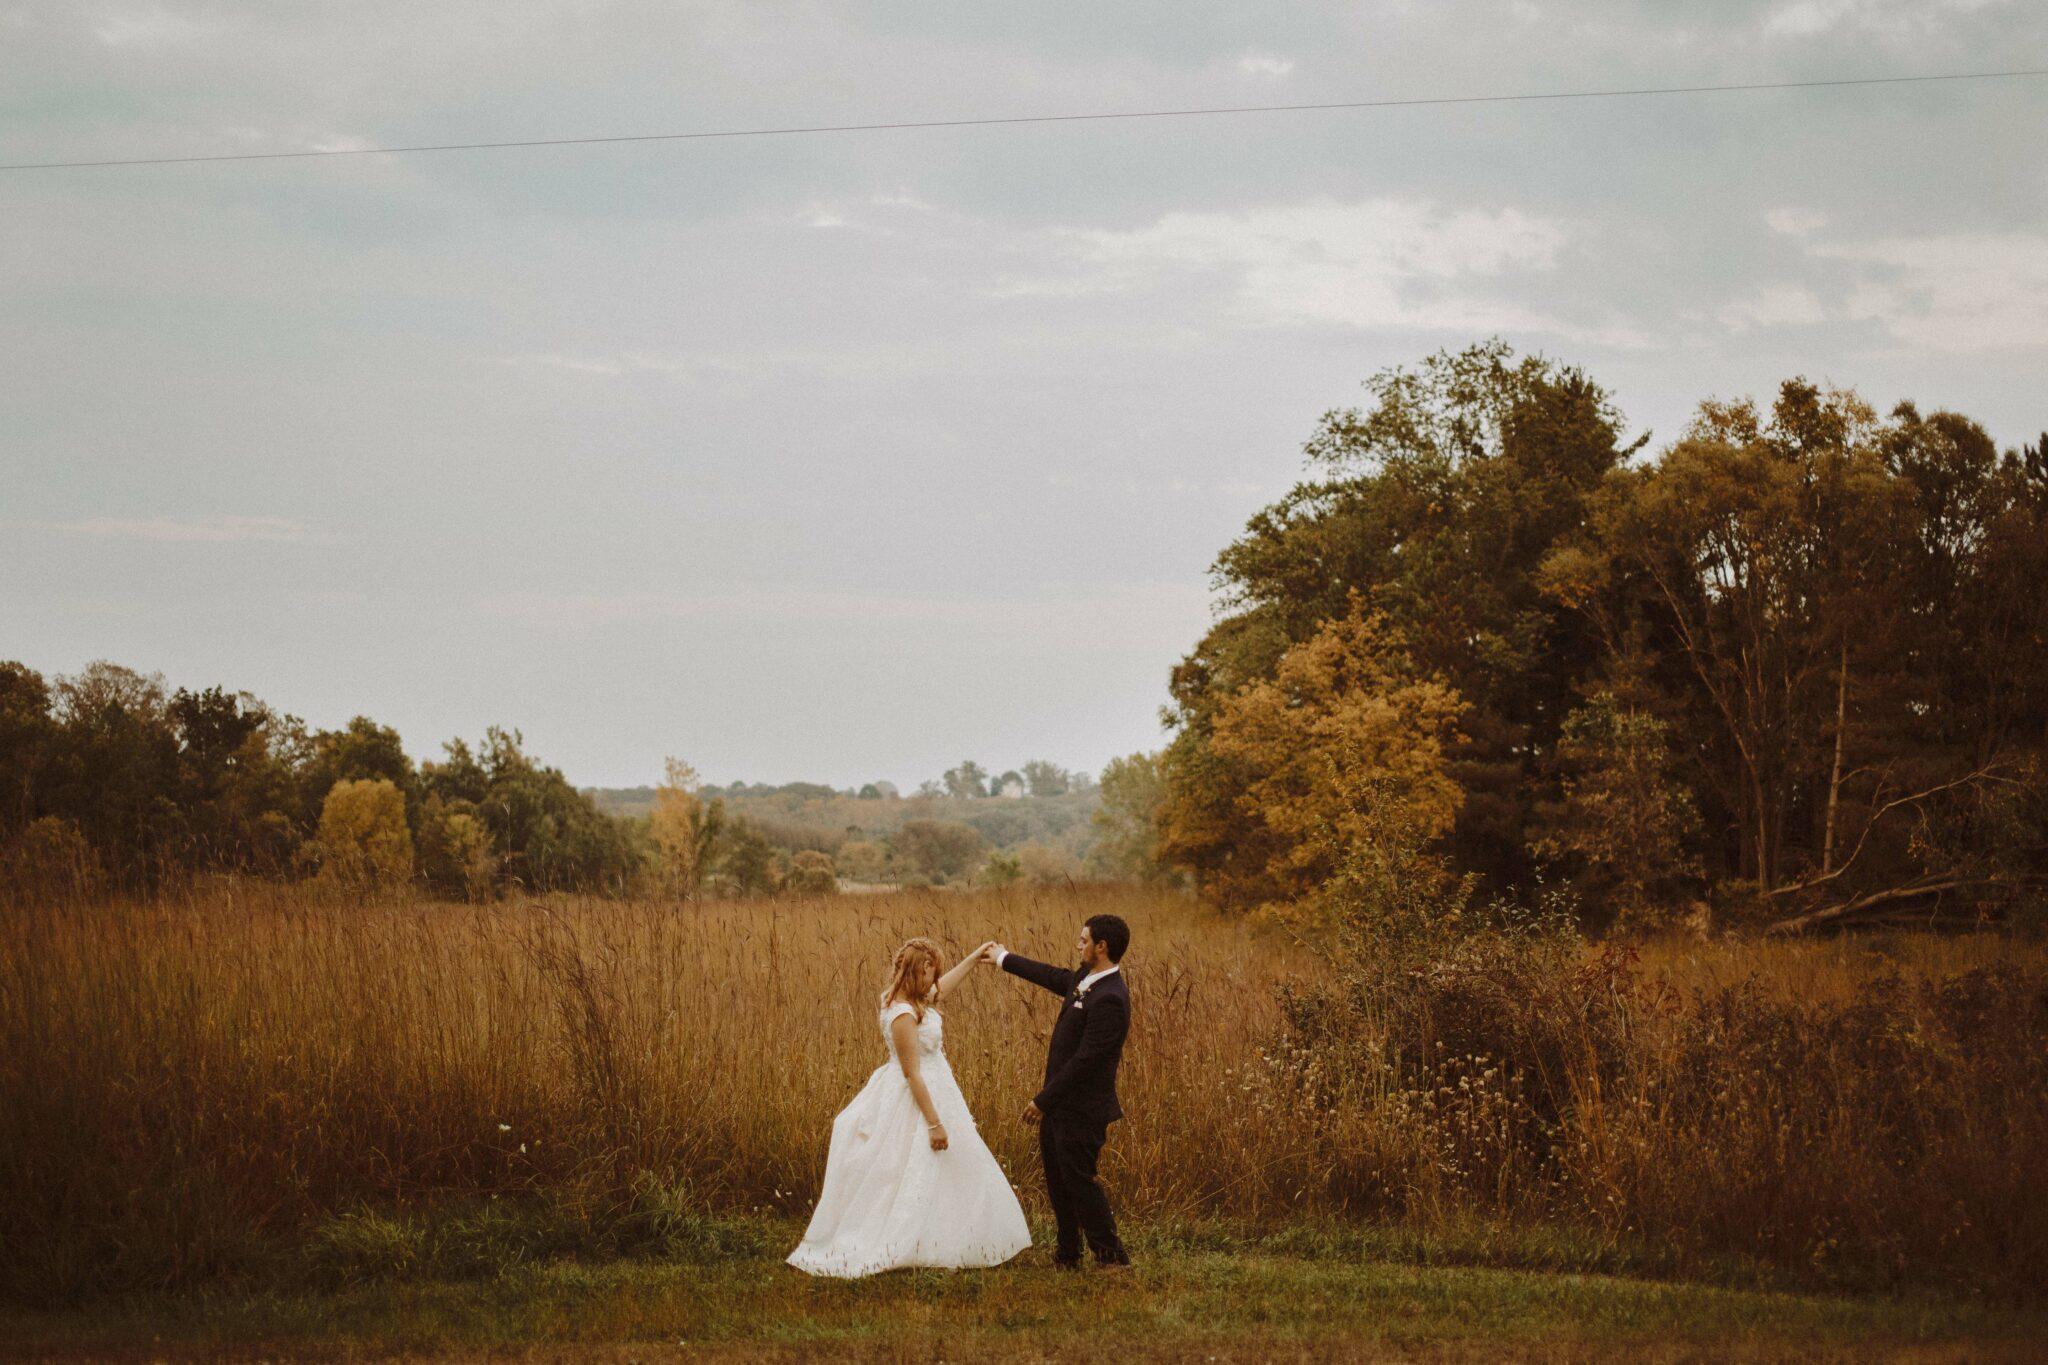 wedding bride groom field